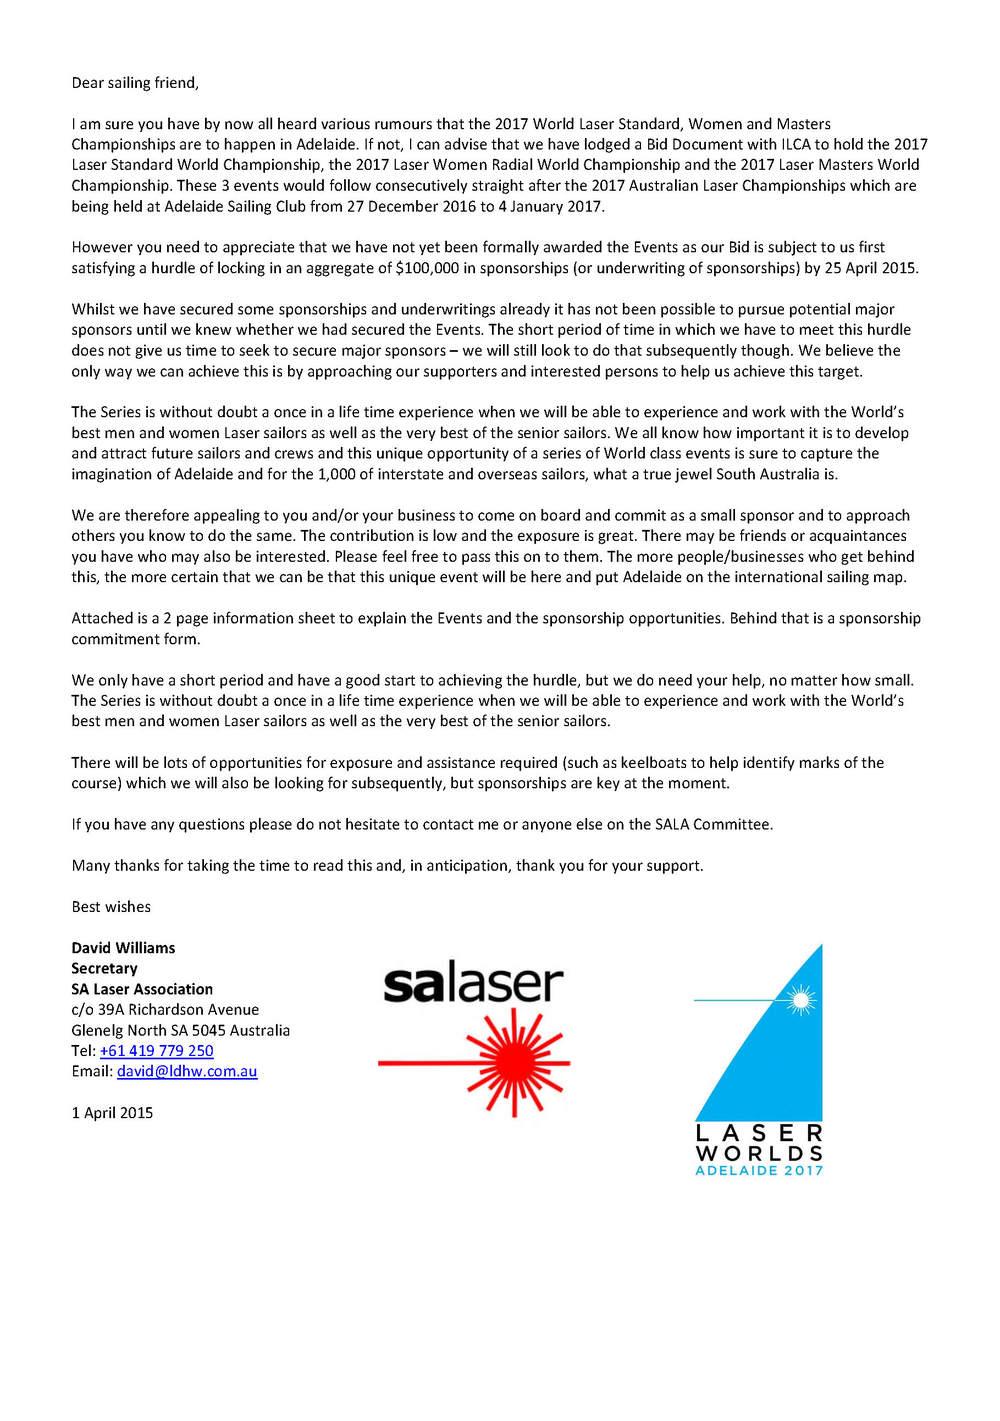 World Laser Sponsorship Package 01042015[6]_Page_1.jpg